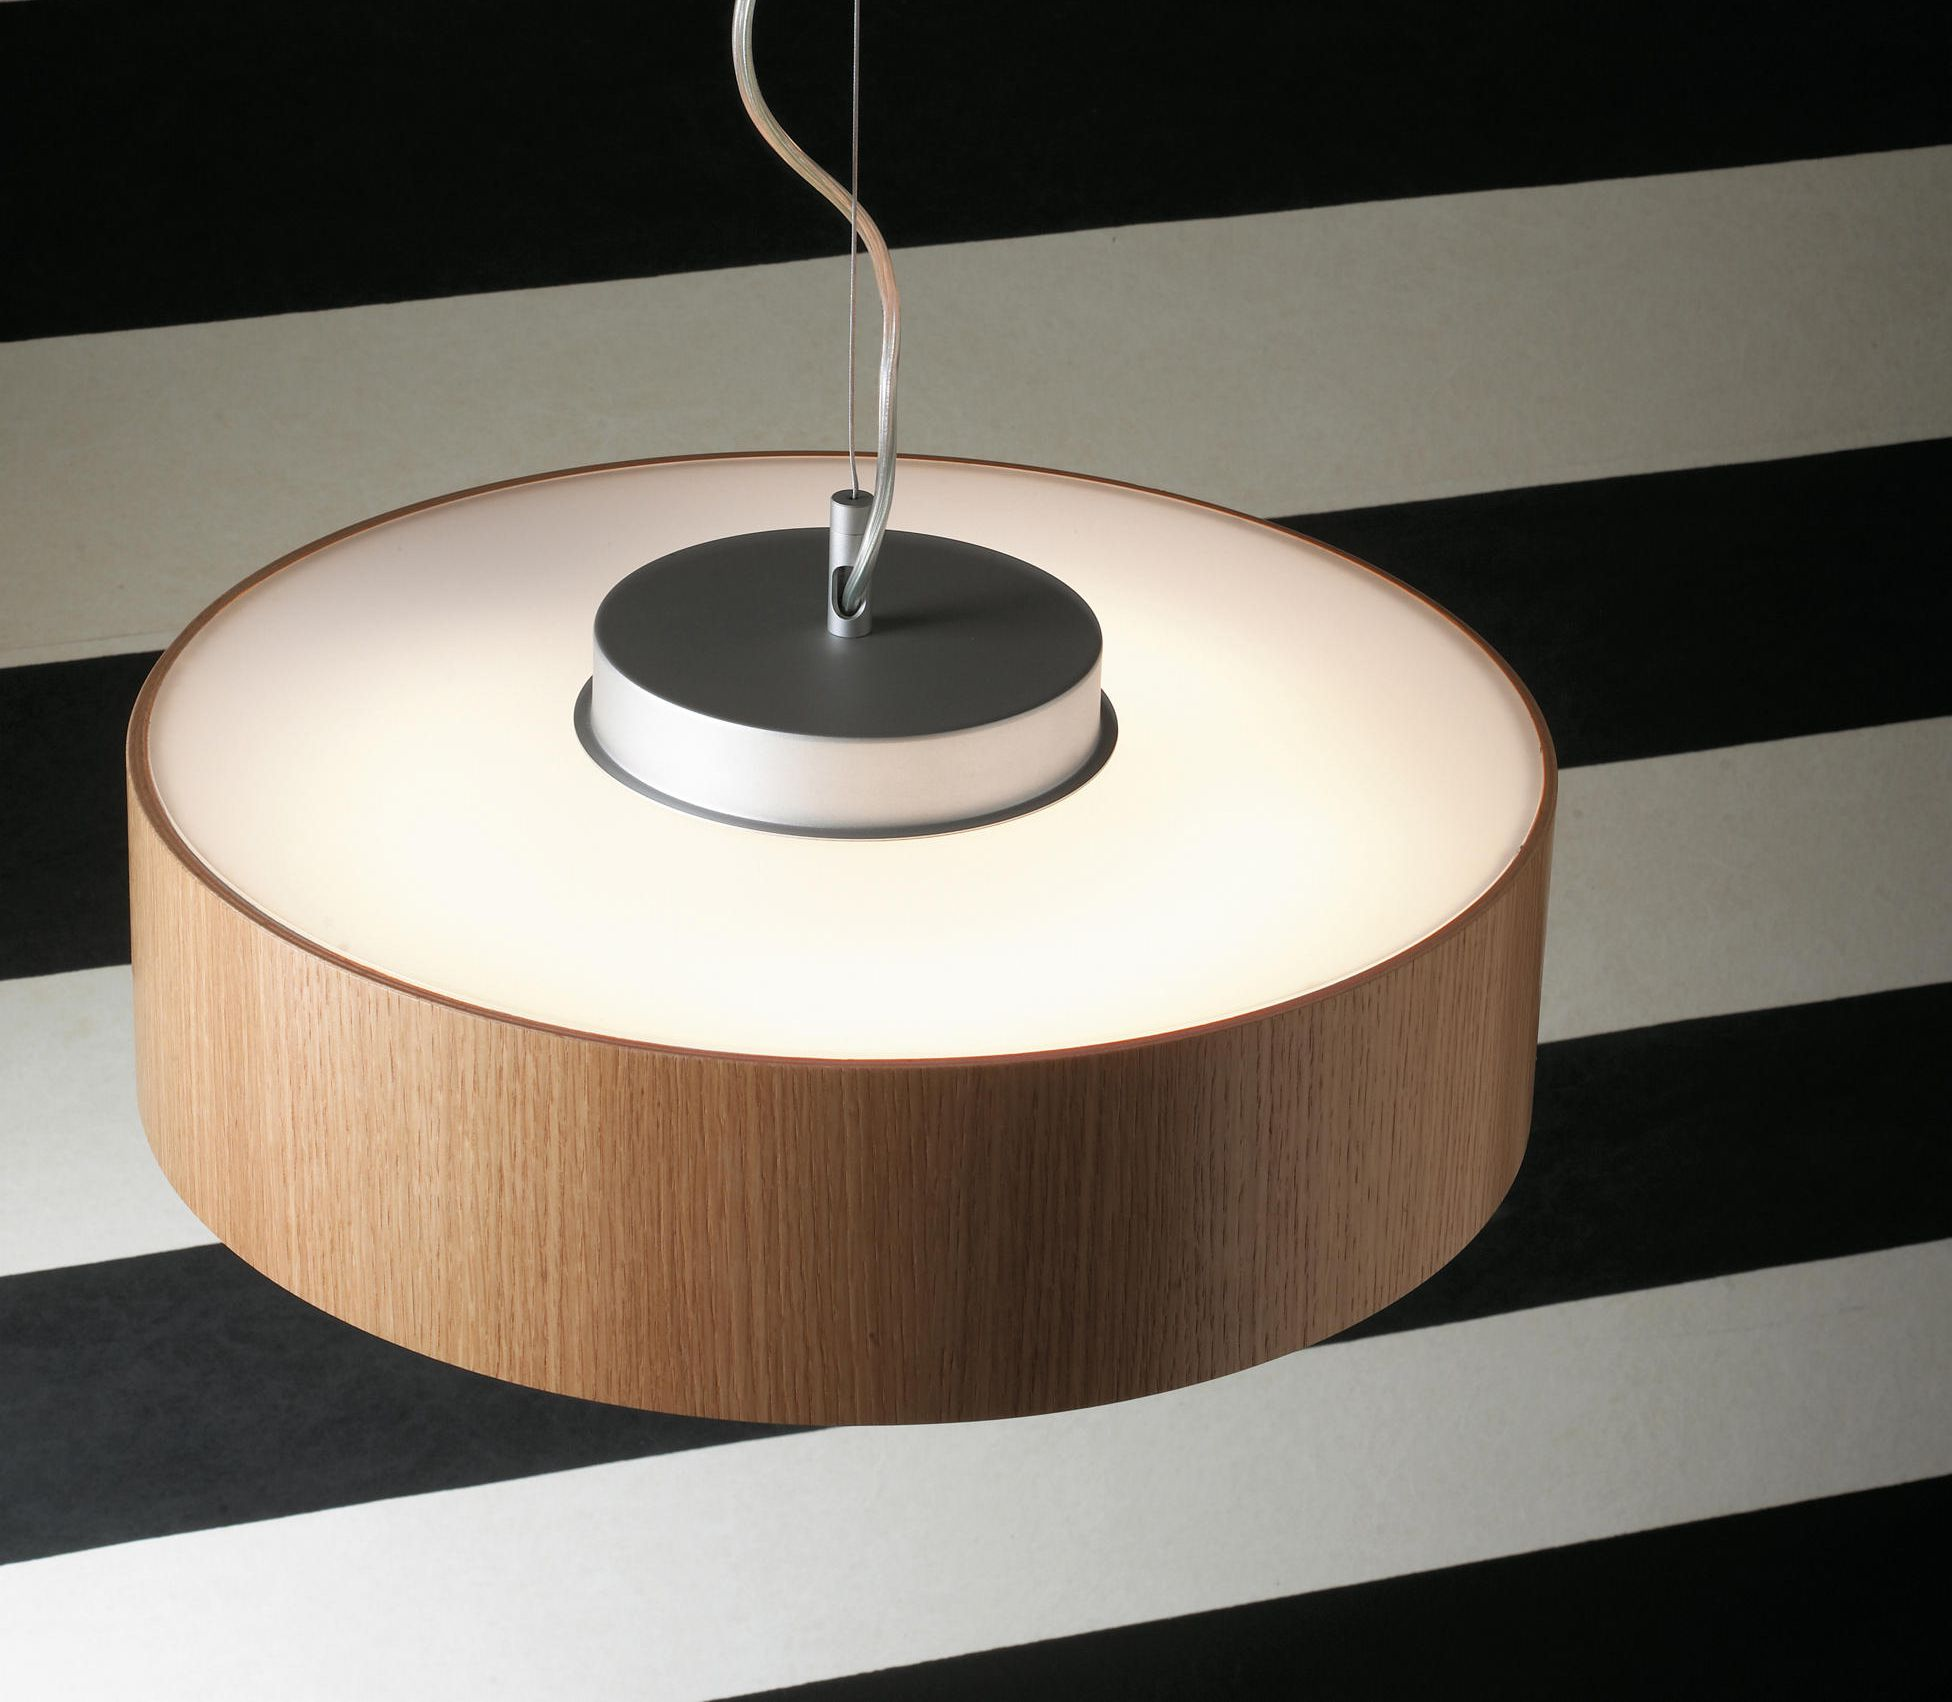 Ronda S Pendant Lamp 2Gx13 55w - white